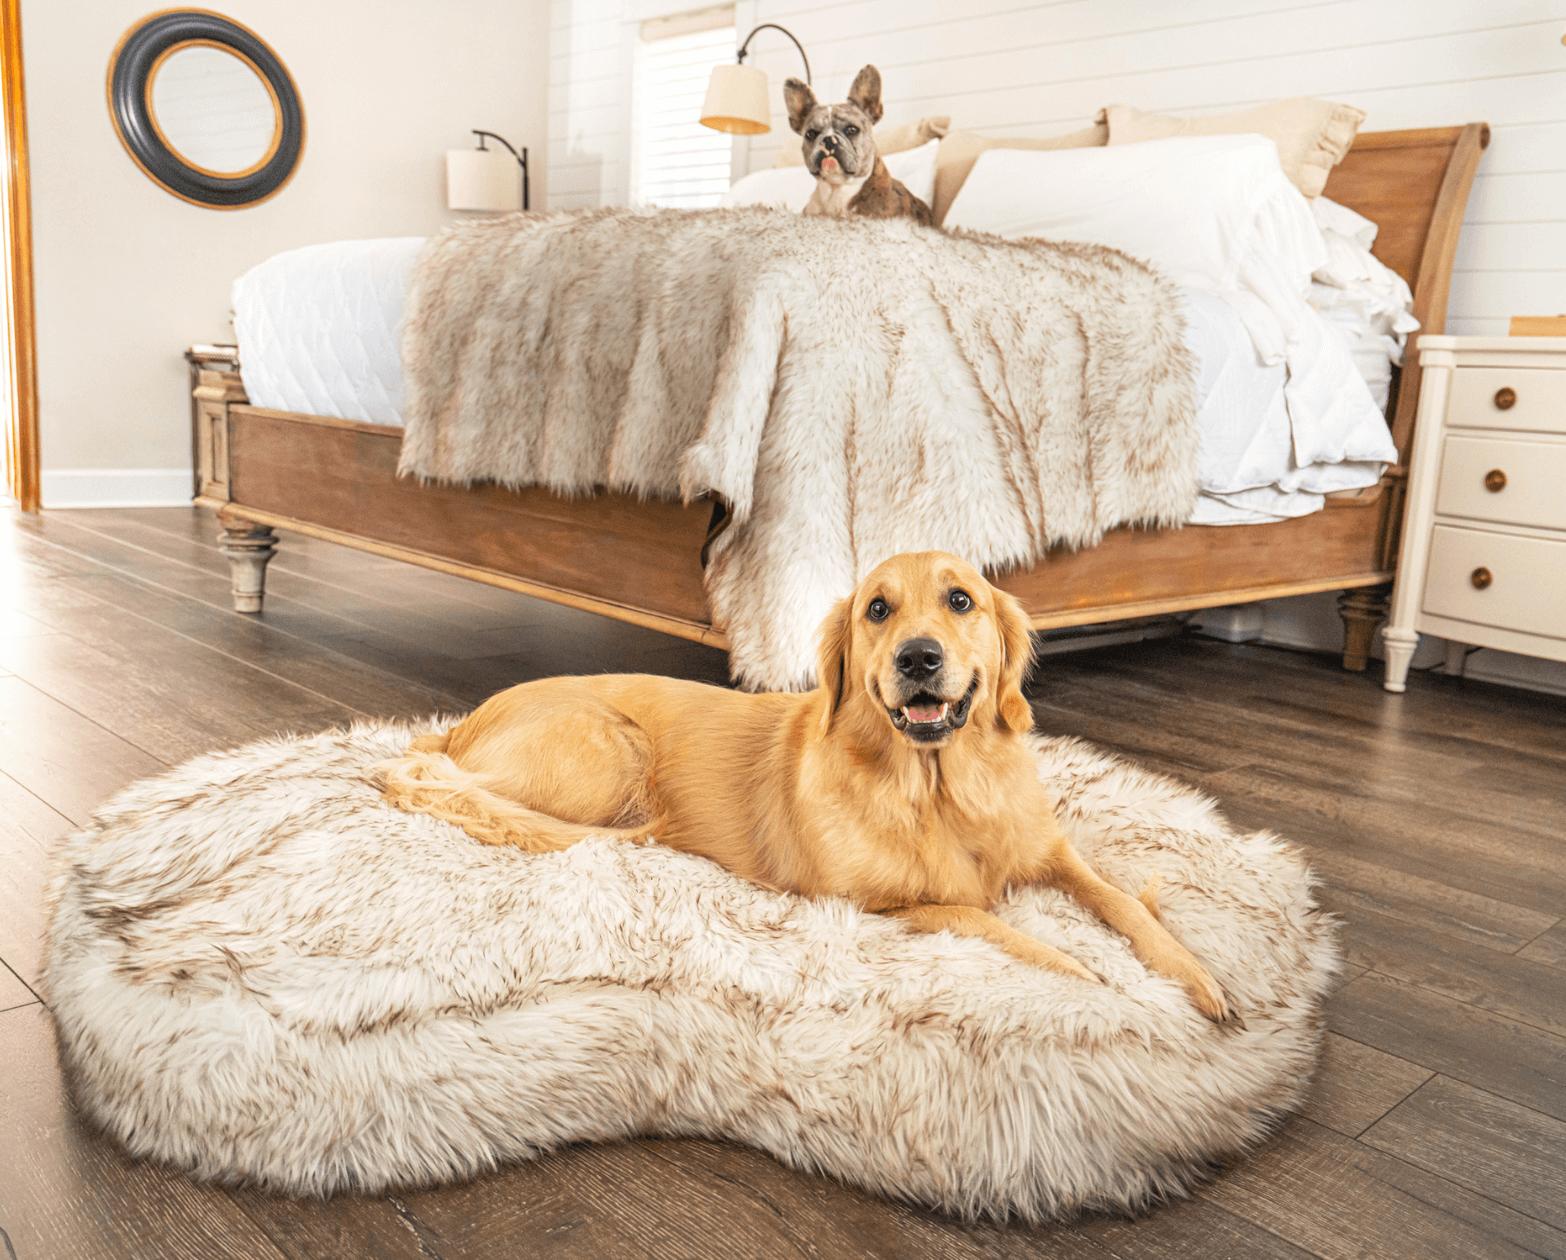 PupCloud™ Bundle – Ultra Thick Memory Foam Dog Bed Curve, White + Matching Waterproof Blanket Pet Beds, Mats & Houses Pet Designer Beds